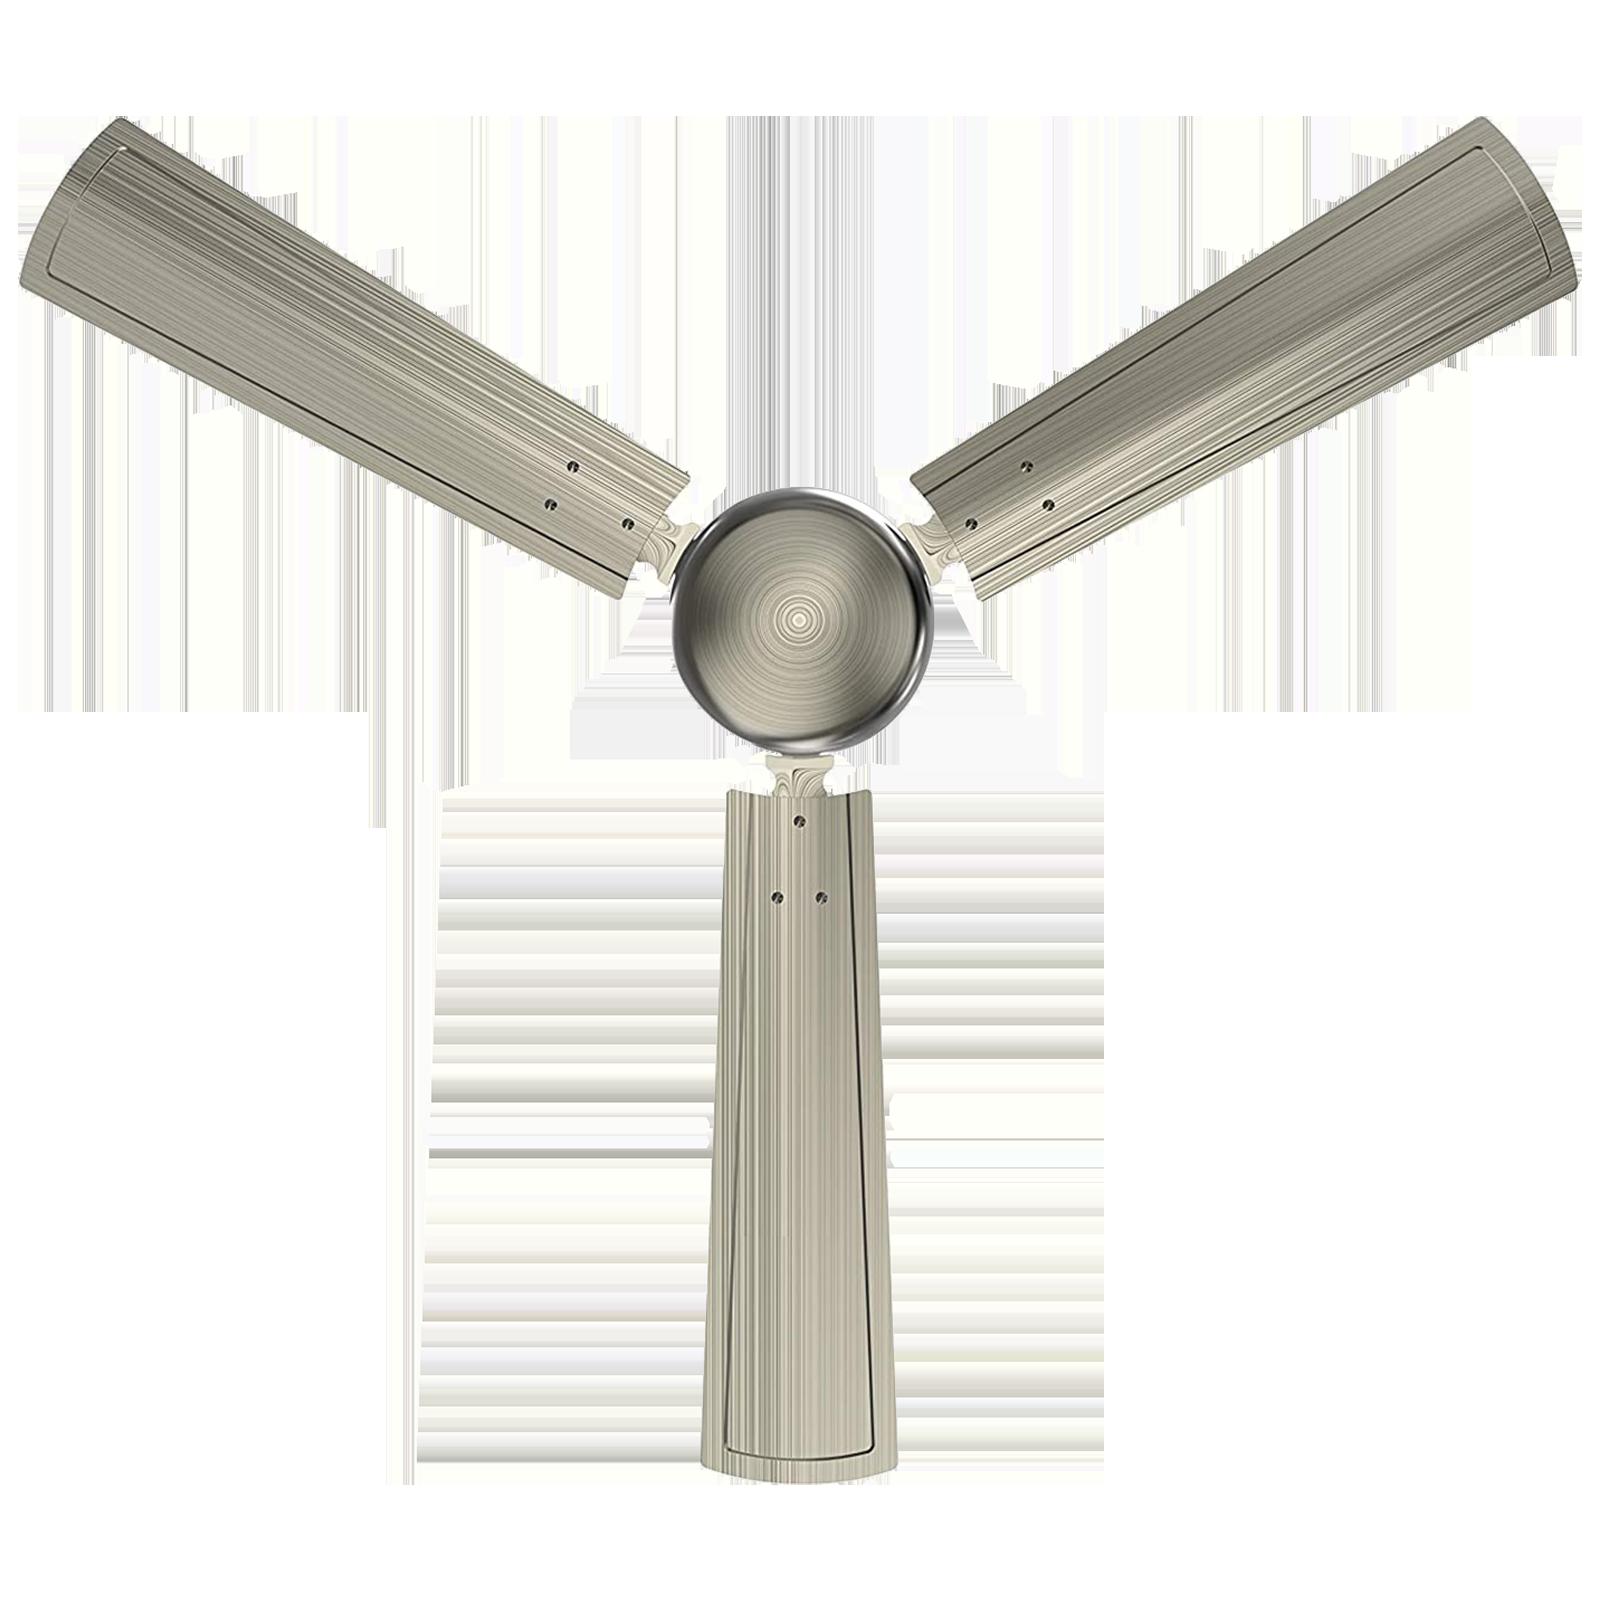 GM Spencer 120 cm Sweep 3 Blade Ceiling Fan (Aerodynamically Designed Blades, CFP480012BAEP, Silver)_1